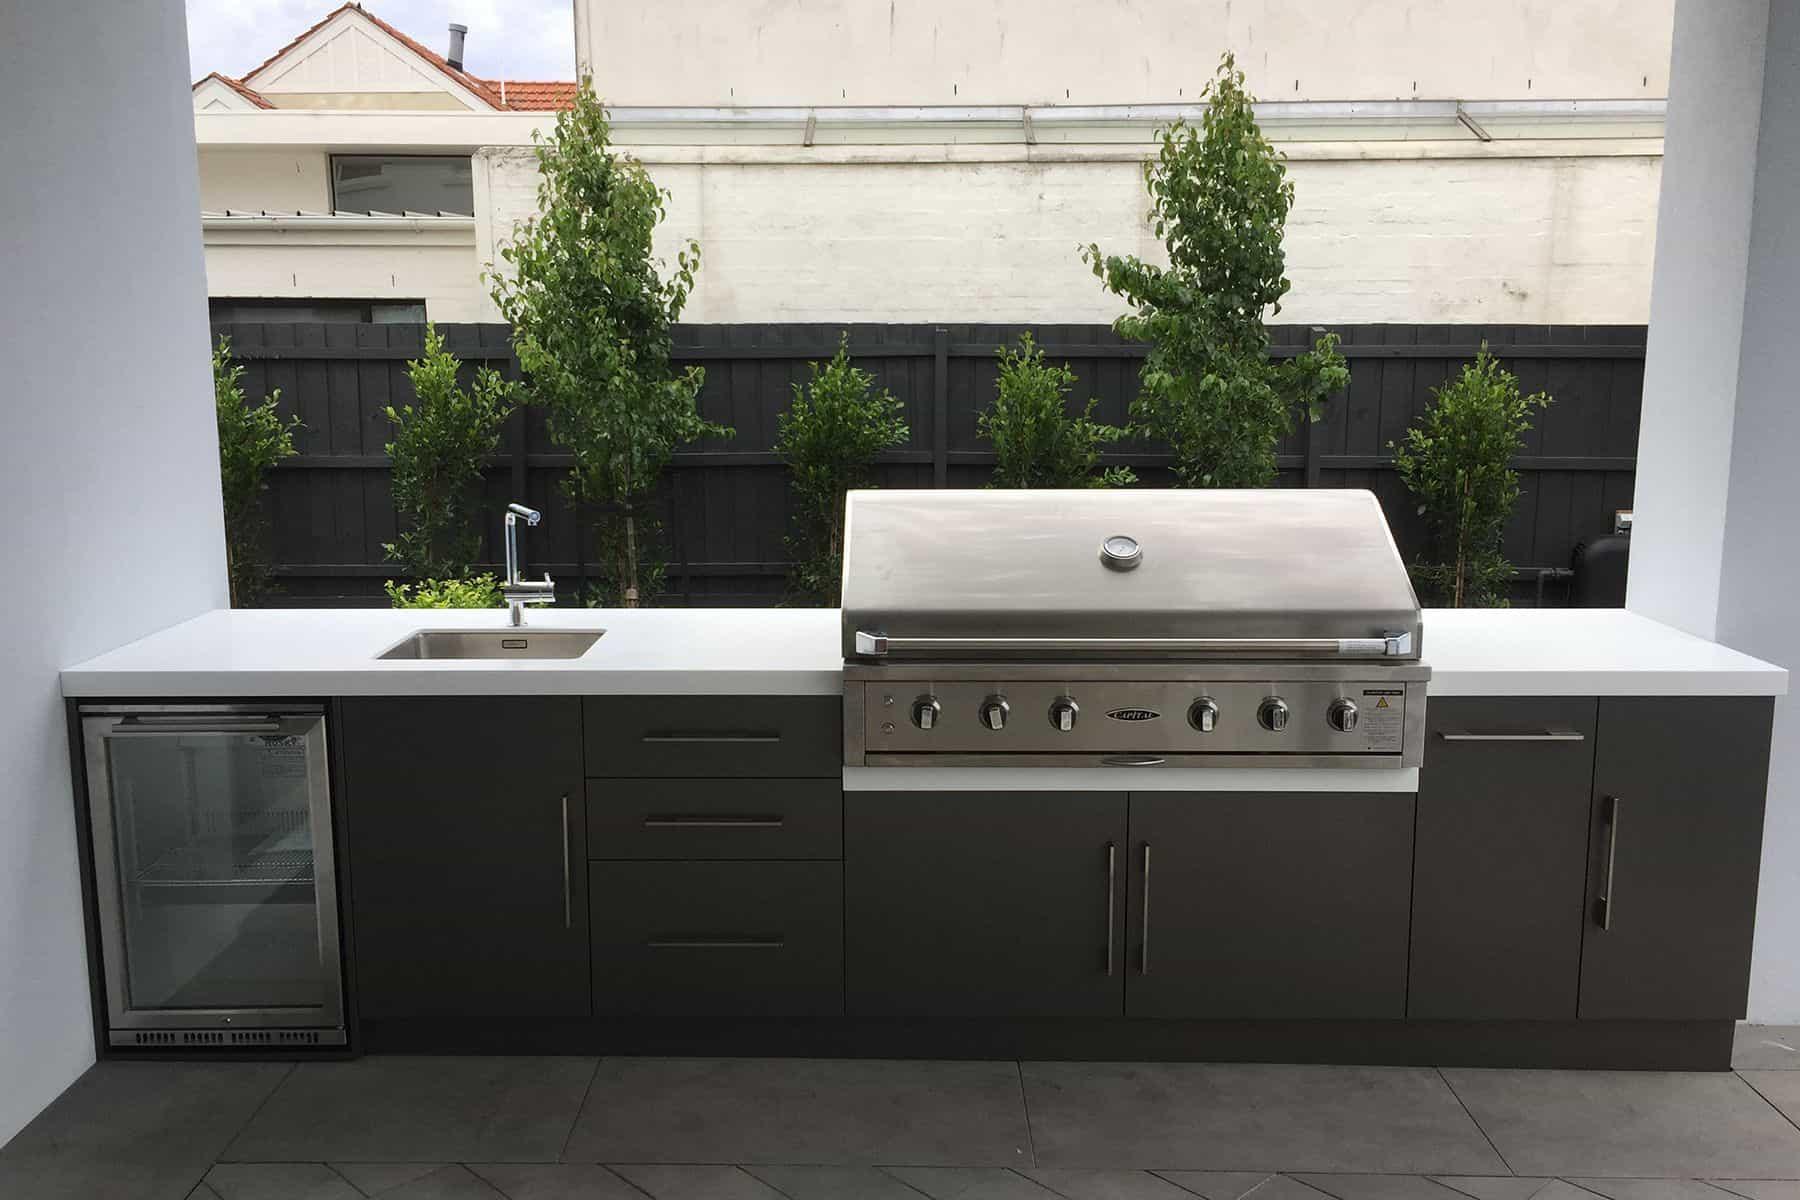 13 Timeless Outdoor BBQ Kitchen Ideas